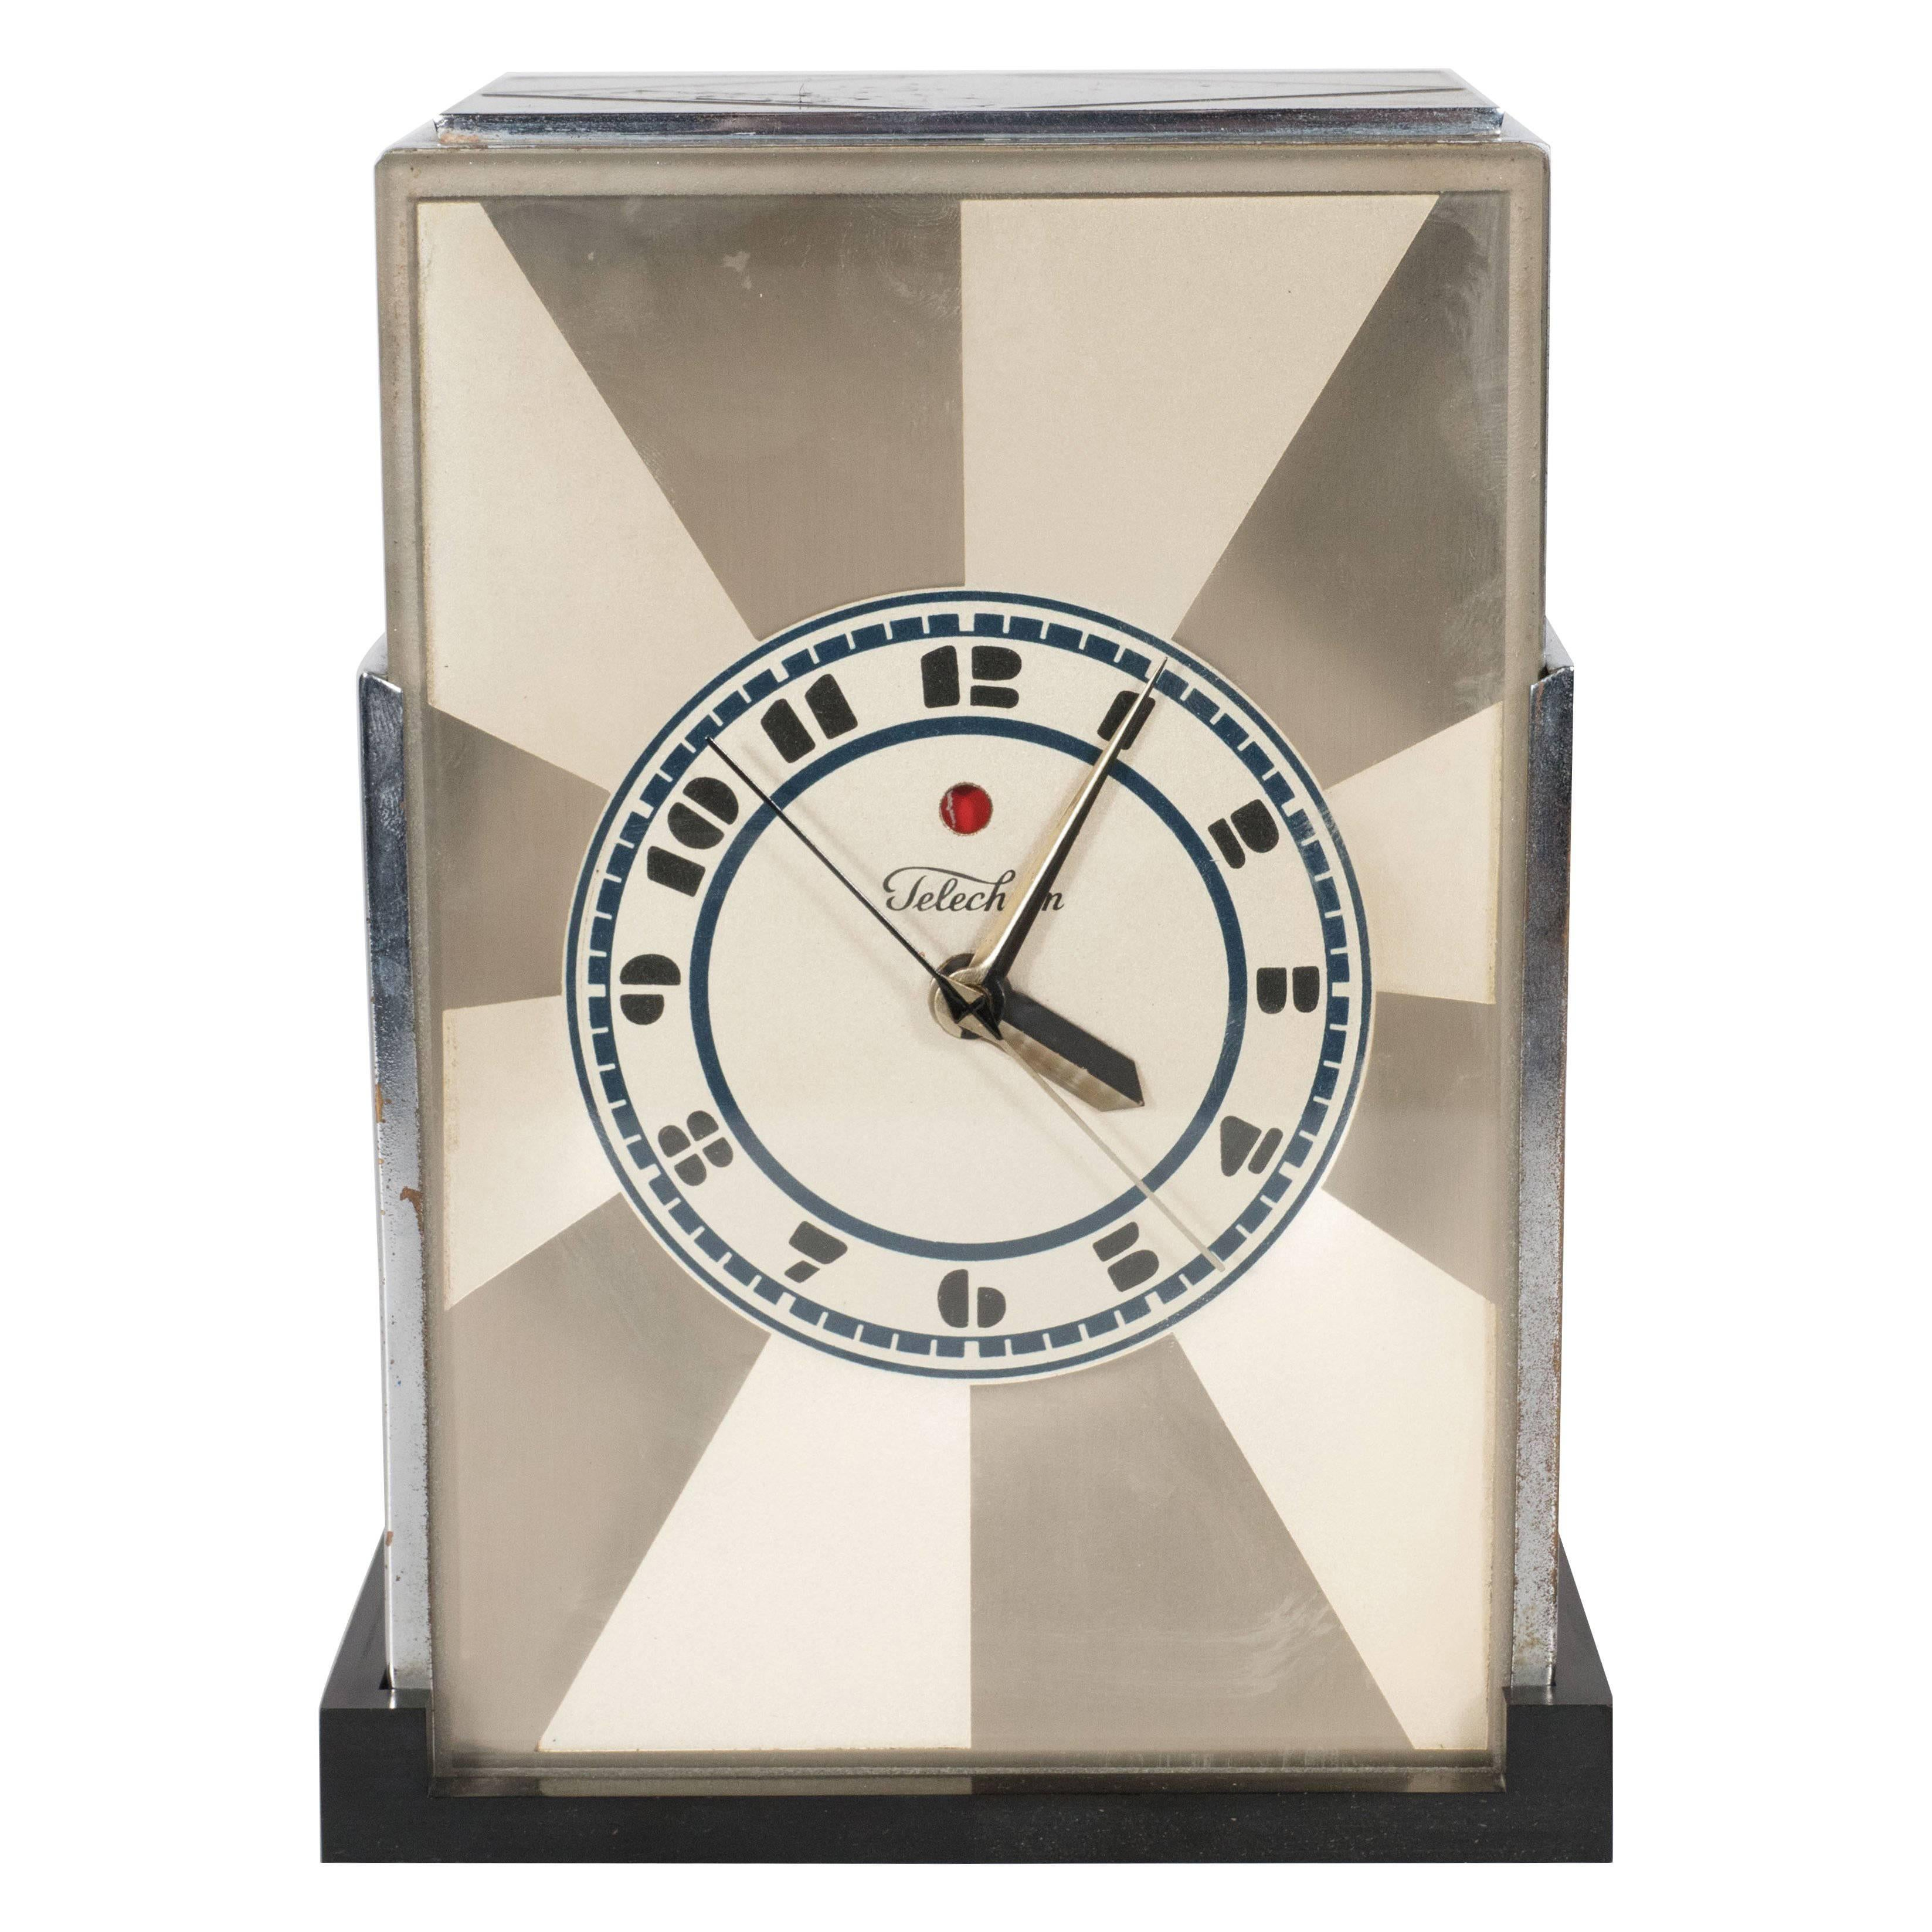 clock by paul frankl for warren telechron company